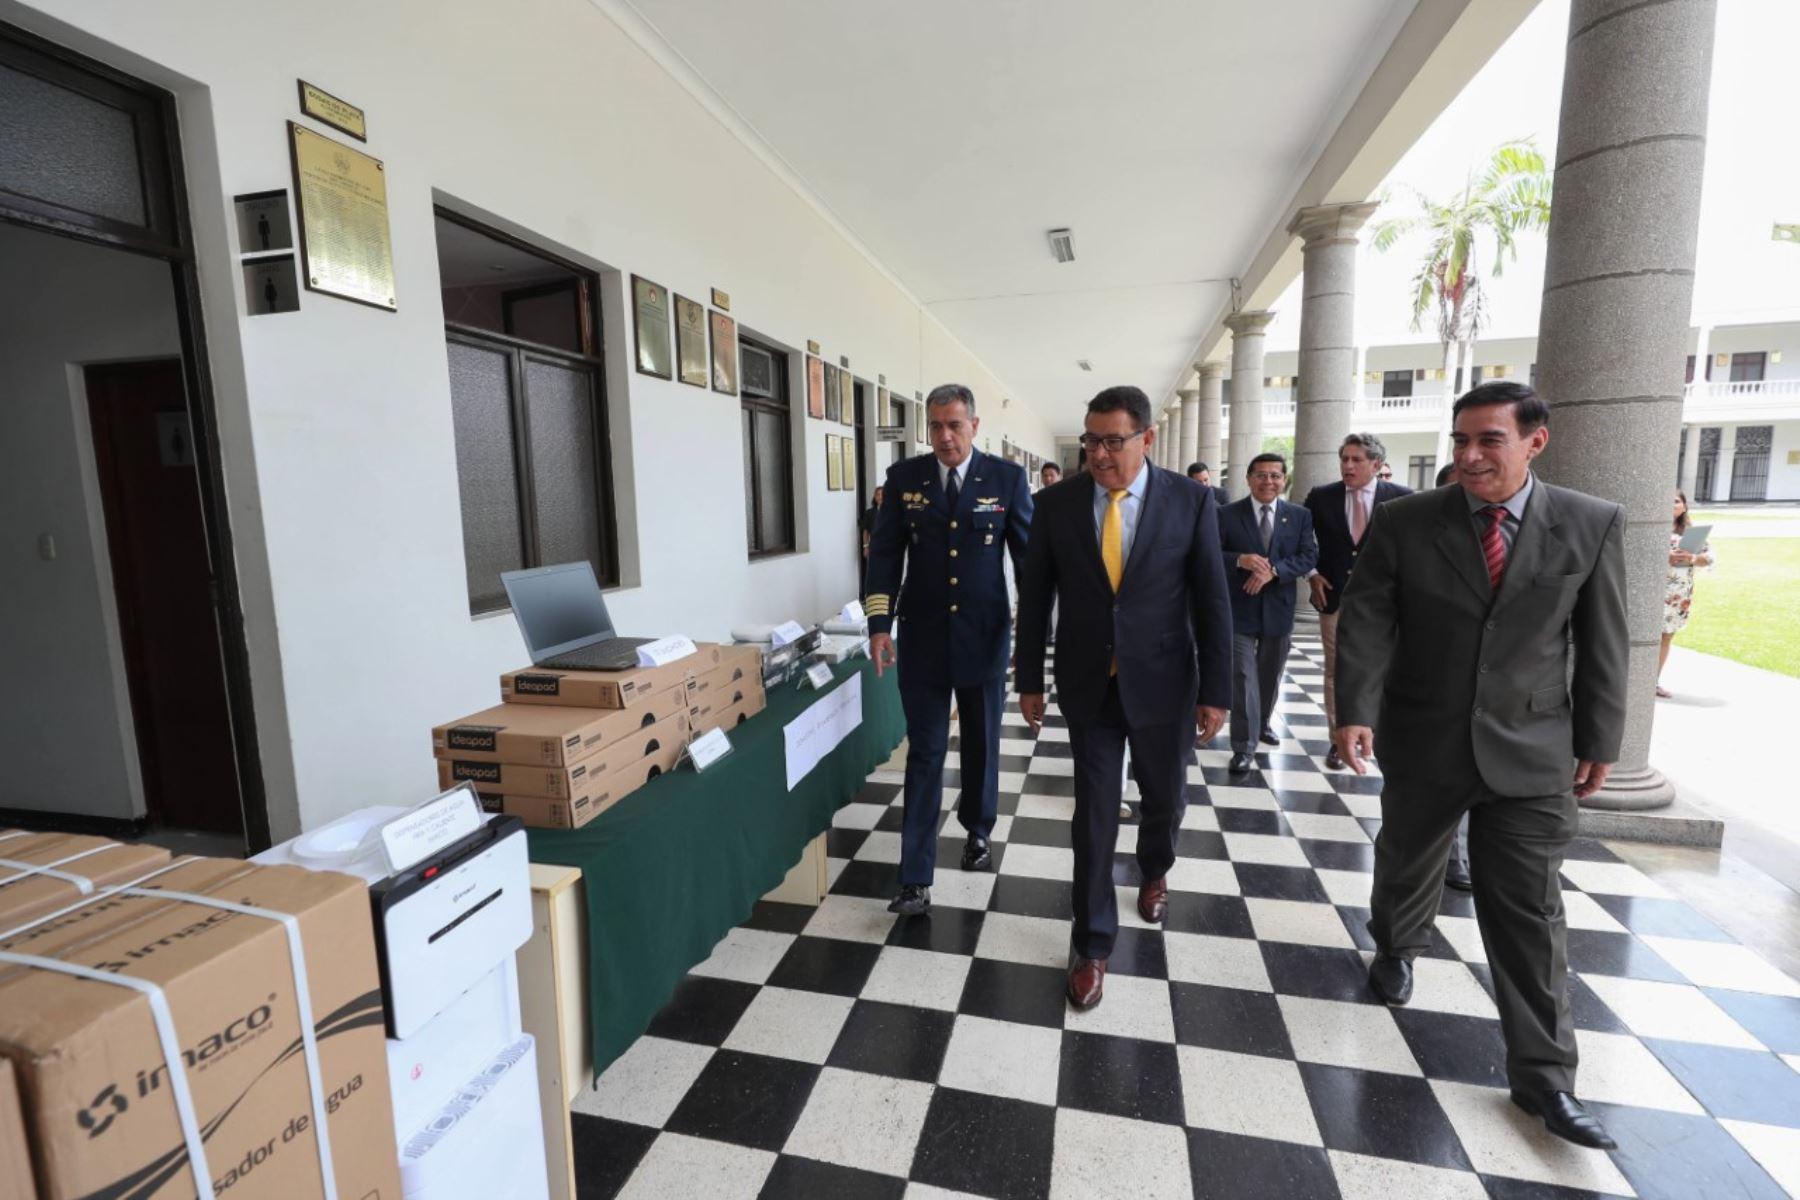 Ministerio de Defensa entregó equipamiento al CAEN para optimizar servicios académicos. Foto: ANDINA/Difusión.